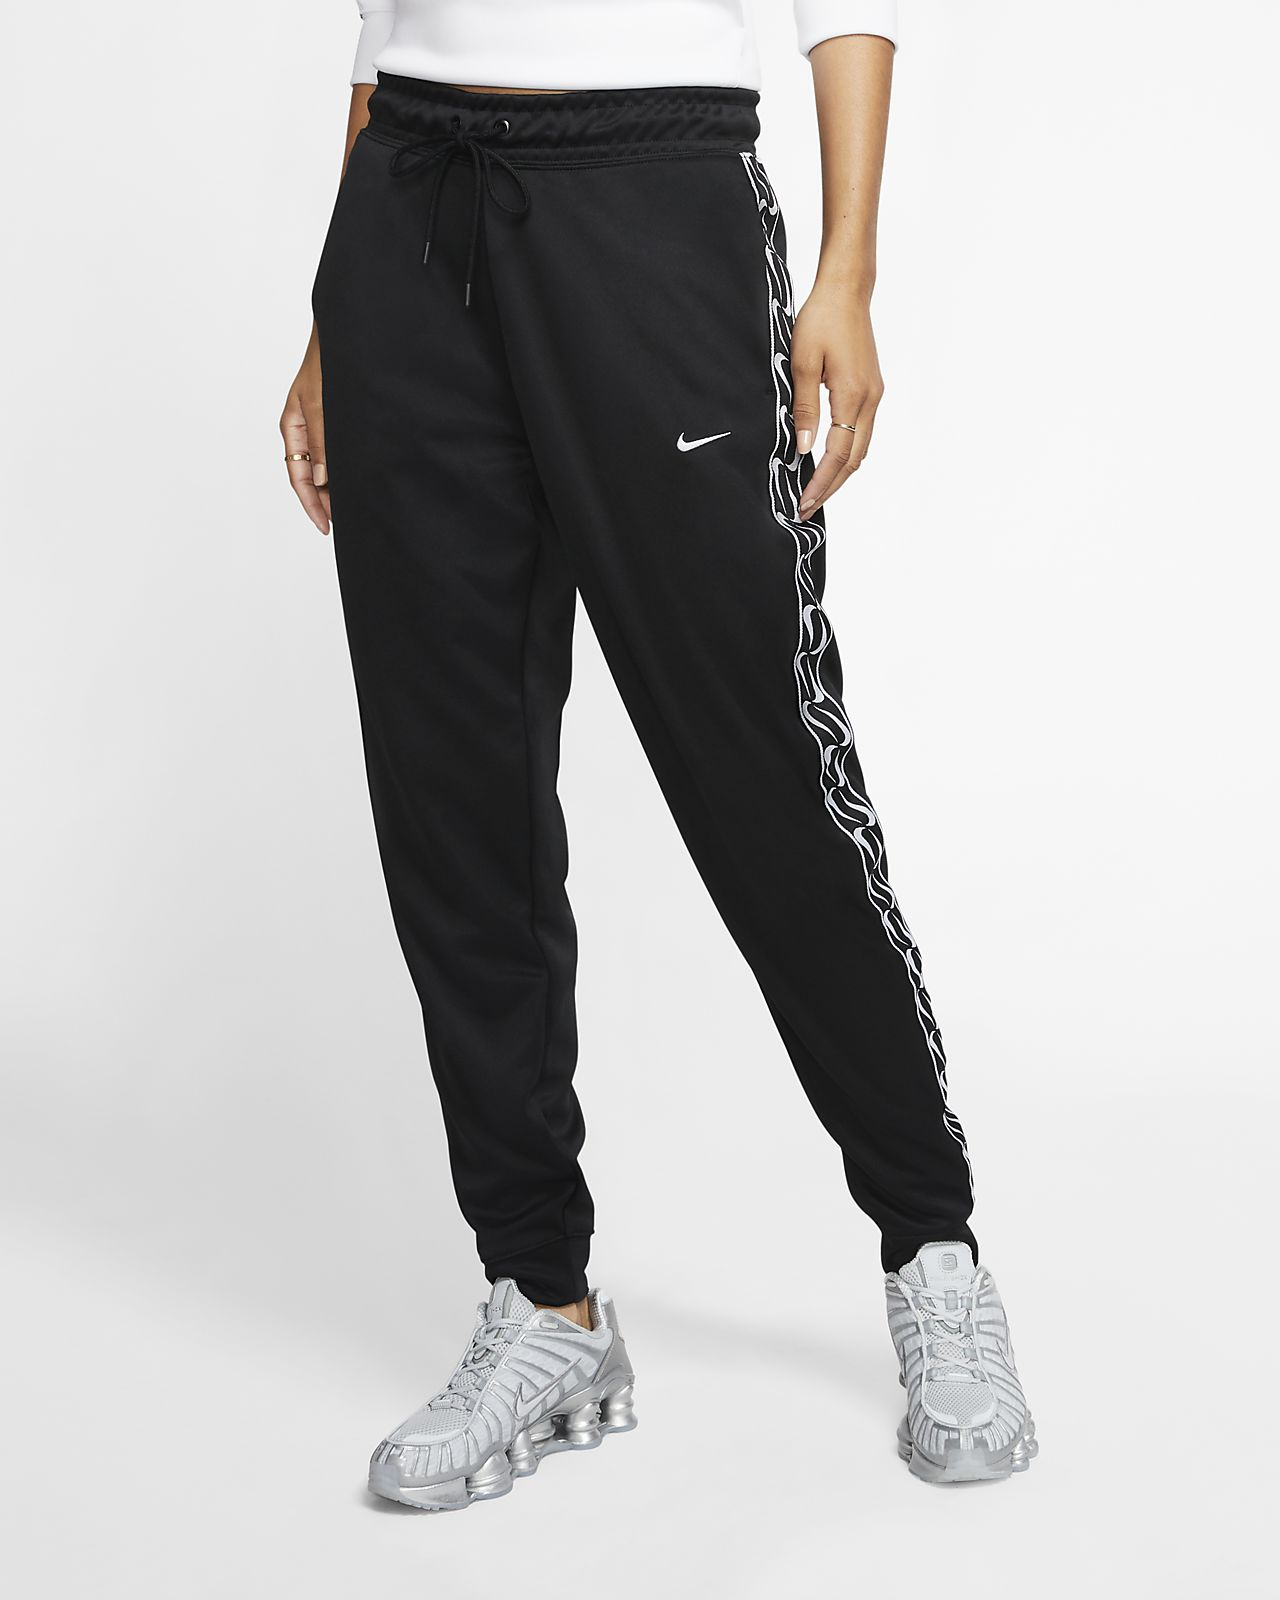 price reduced best sneakers quality products Pantalon de jogging avec logo Nike Sportswear pour Femme